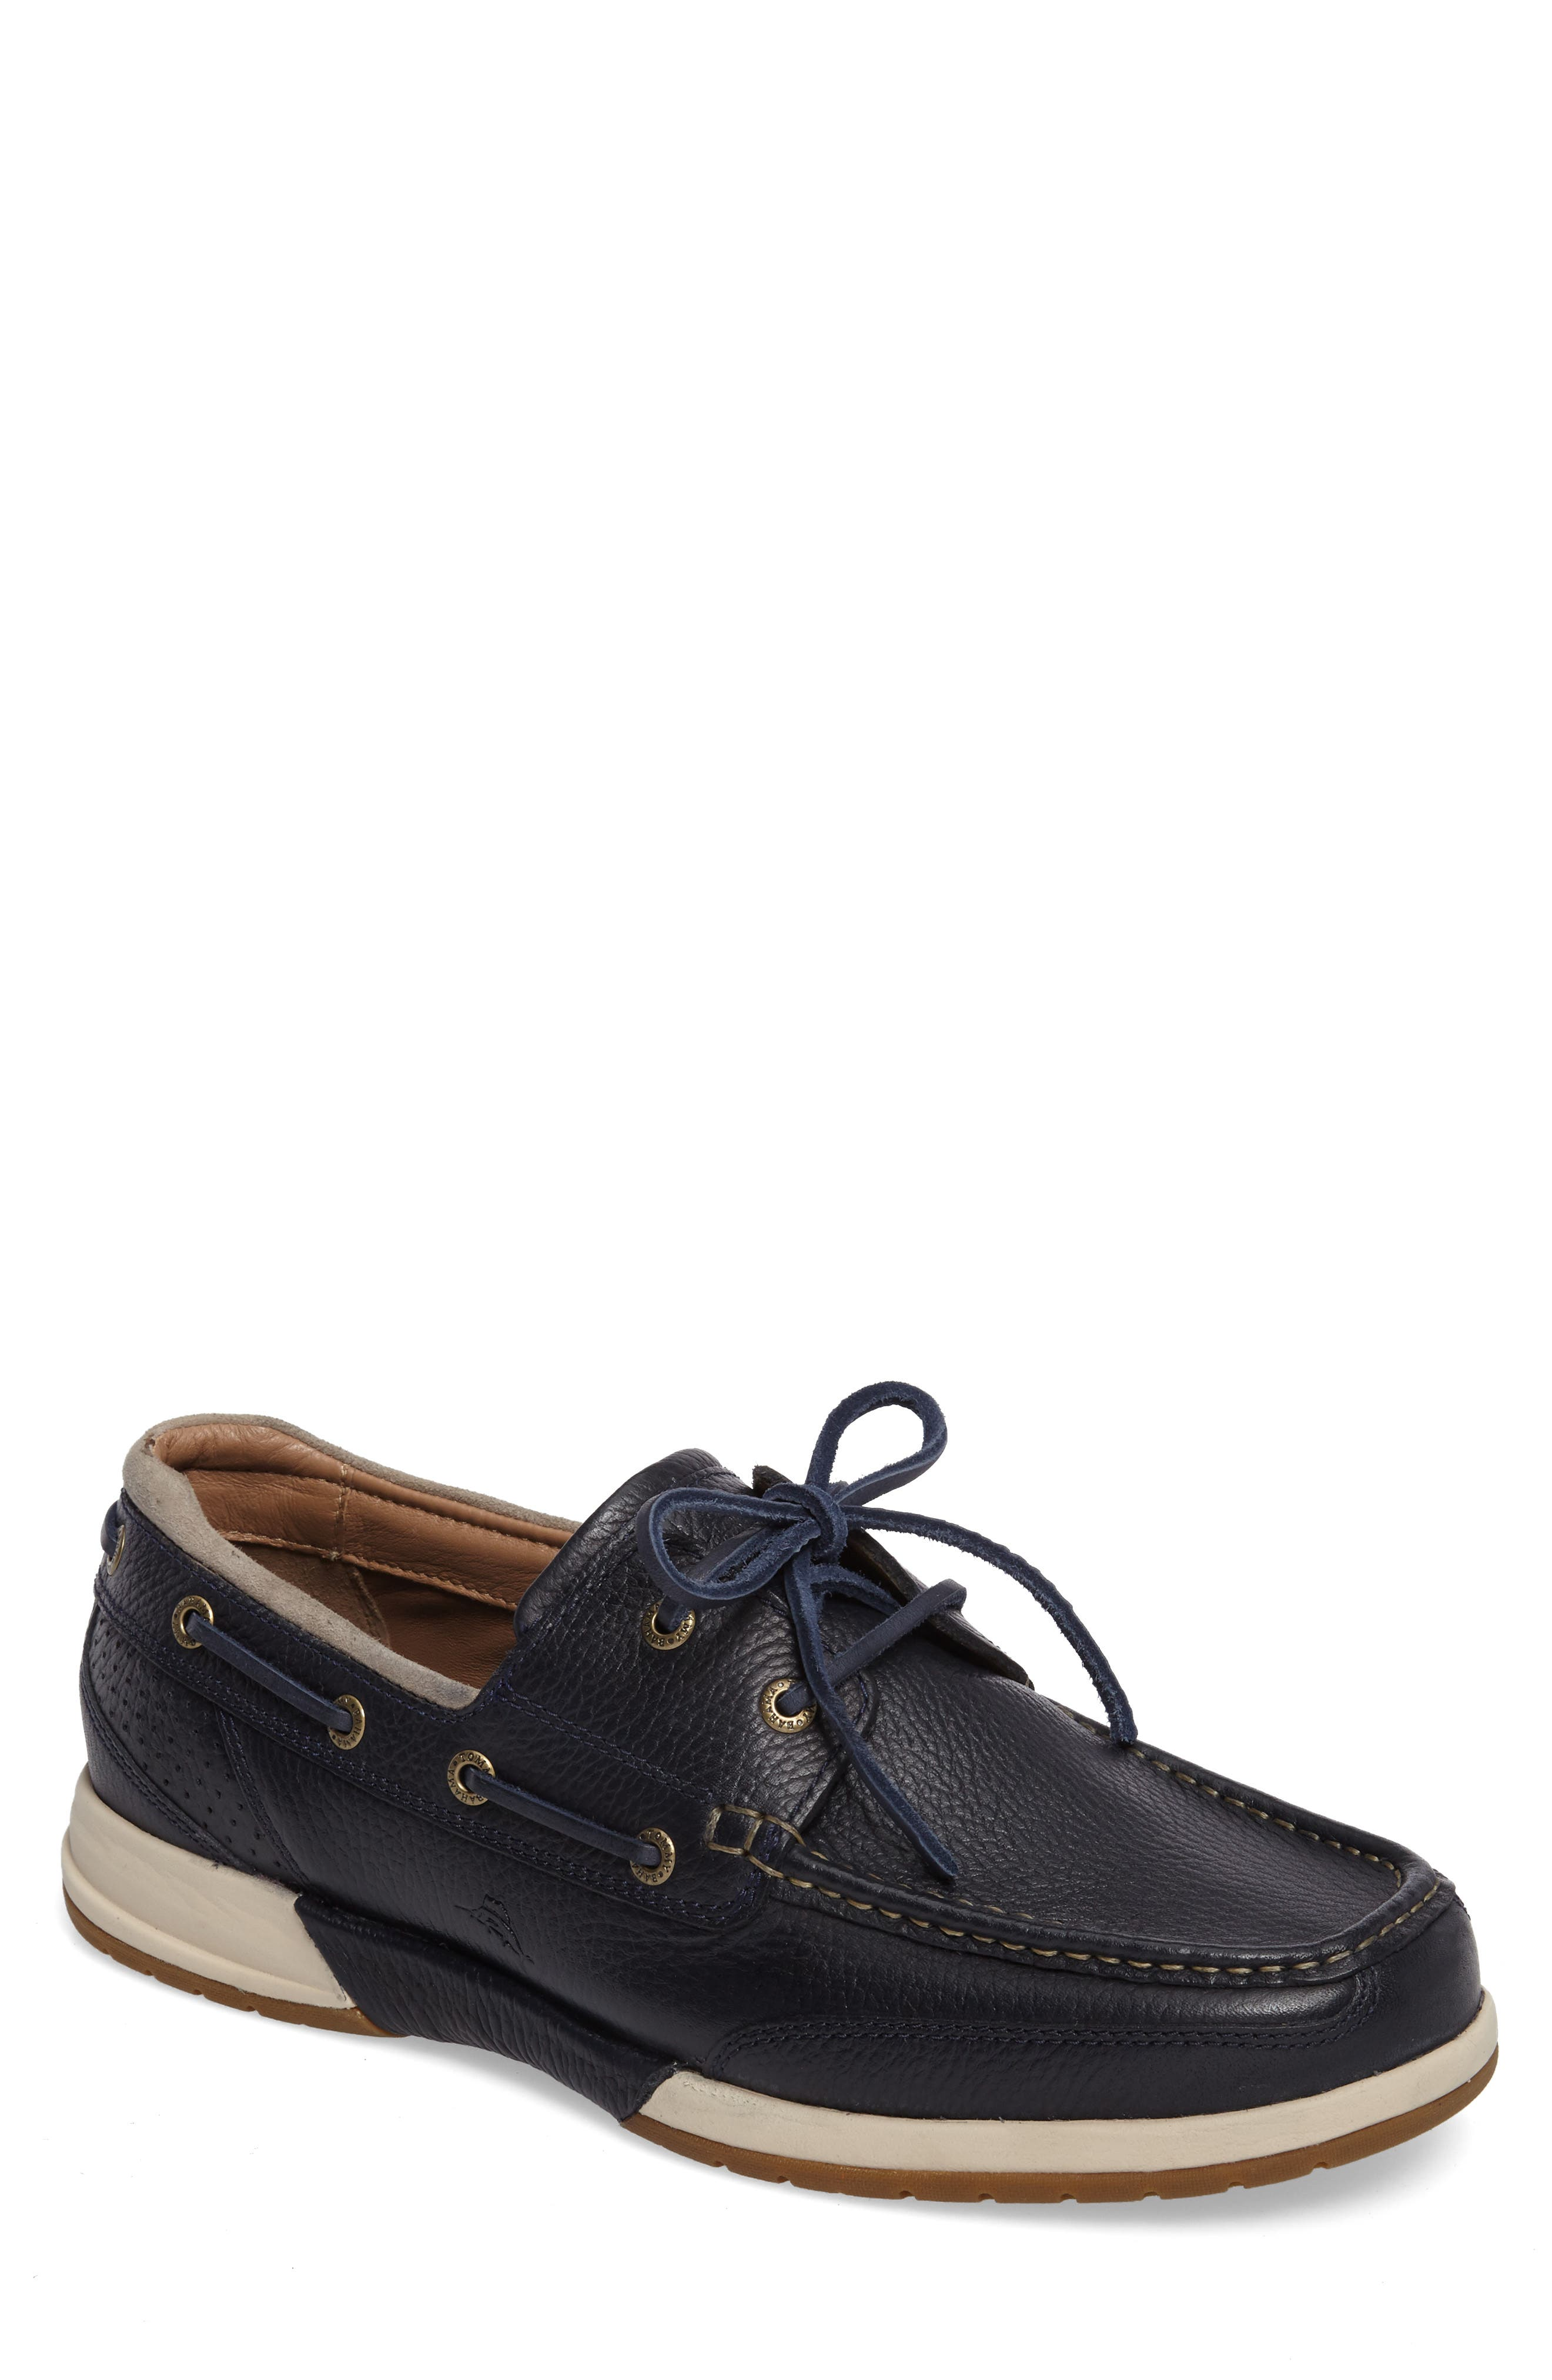 Main Image - Tommy Bahama Ashore Thing Boat Shoe (Men)